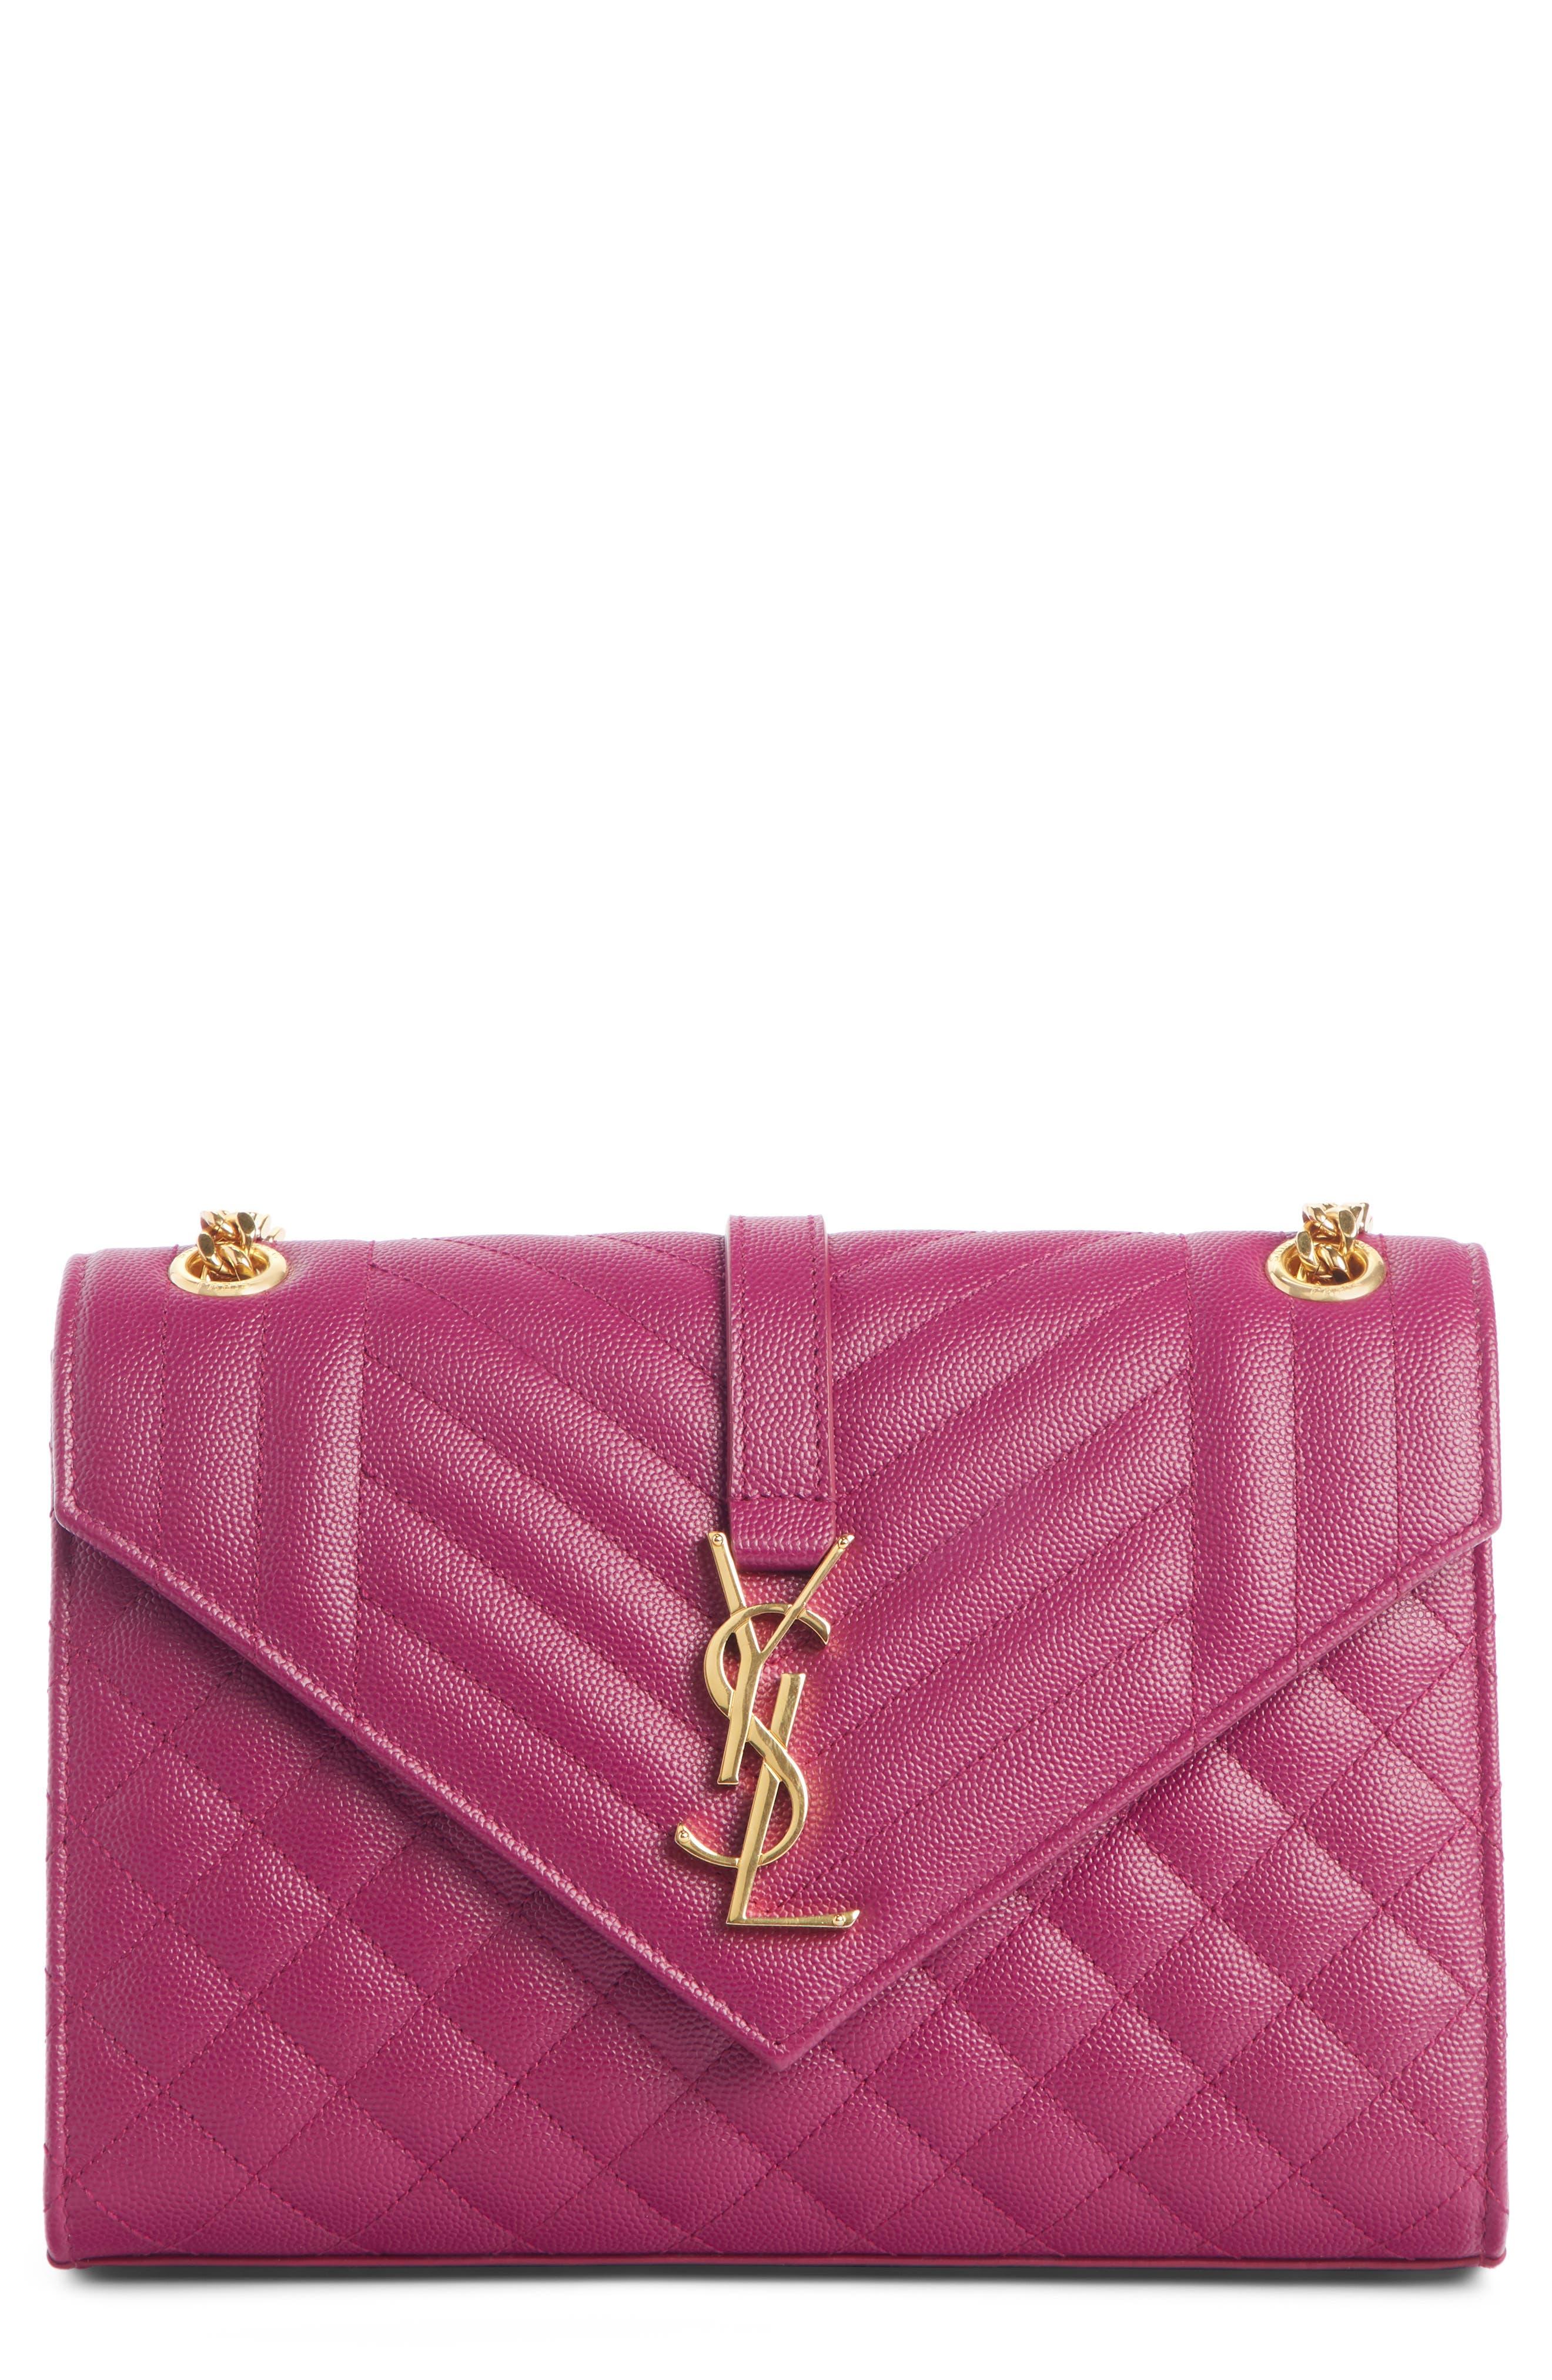 SAINT LAURENT, Medium Cassandre Calfskin Shoulder Bag, Main thumbnail 1, color, DARK GRAPE